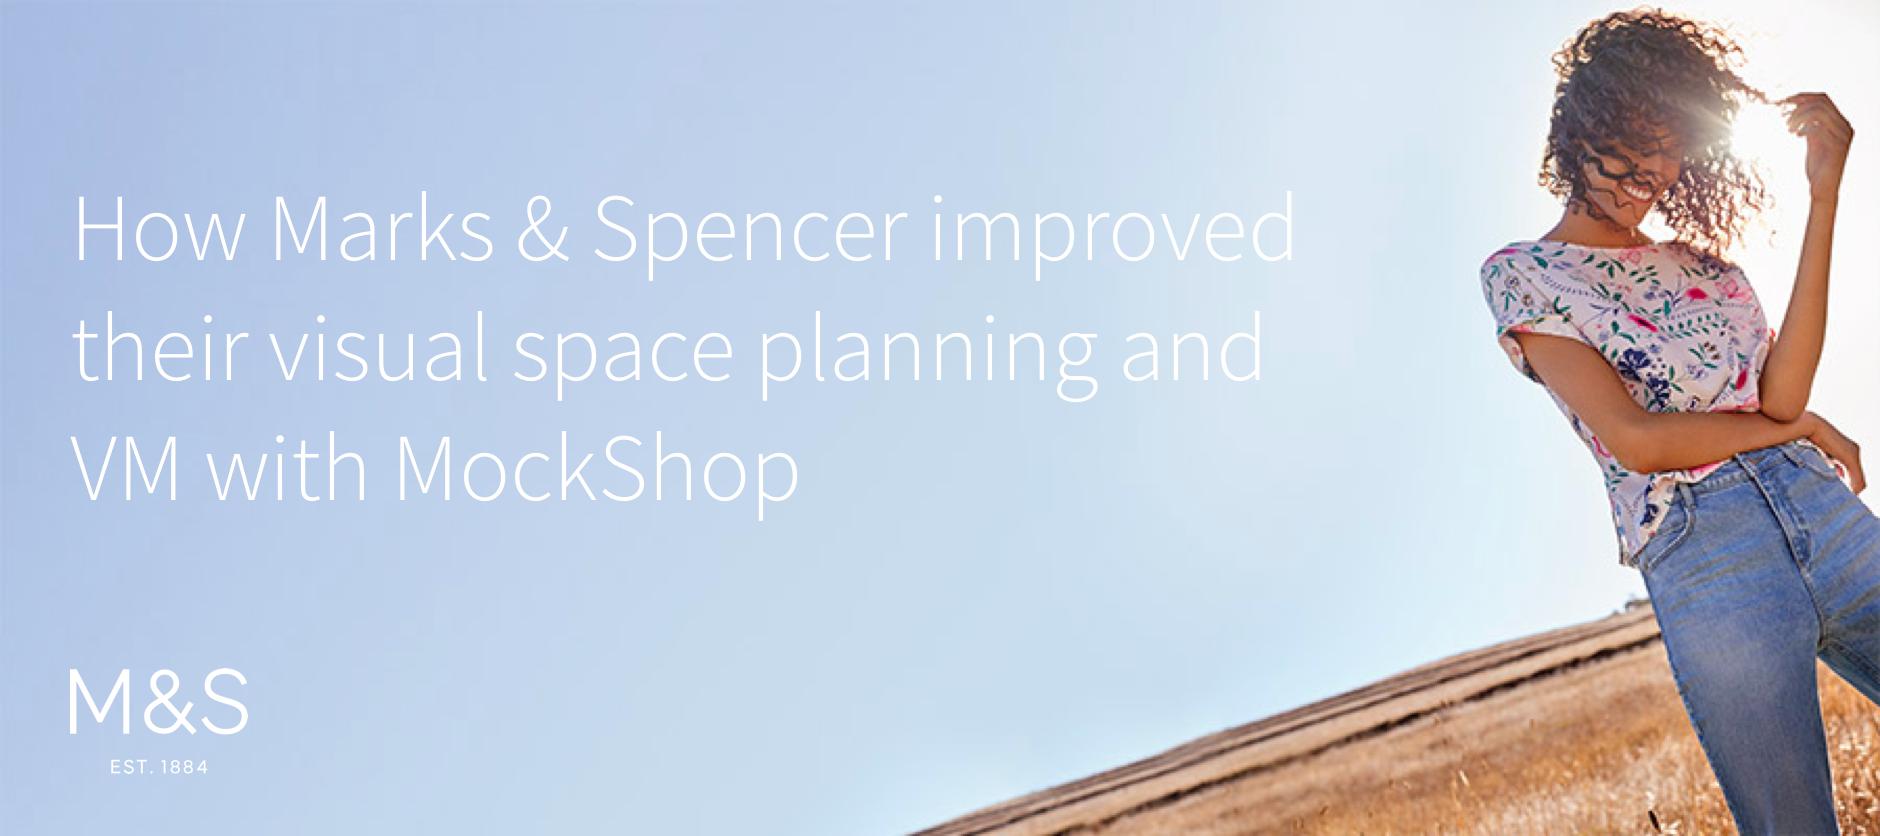 Marks & Spencer, Visual Merchandising Fashion, Retail software solution, Store planogram